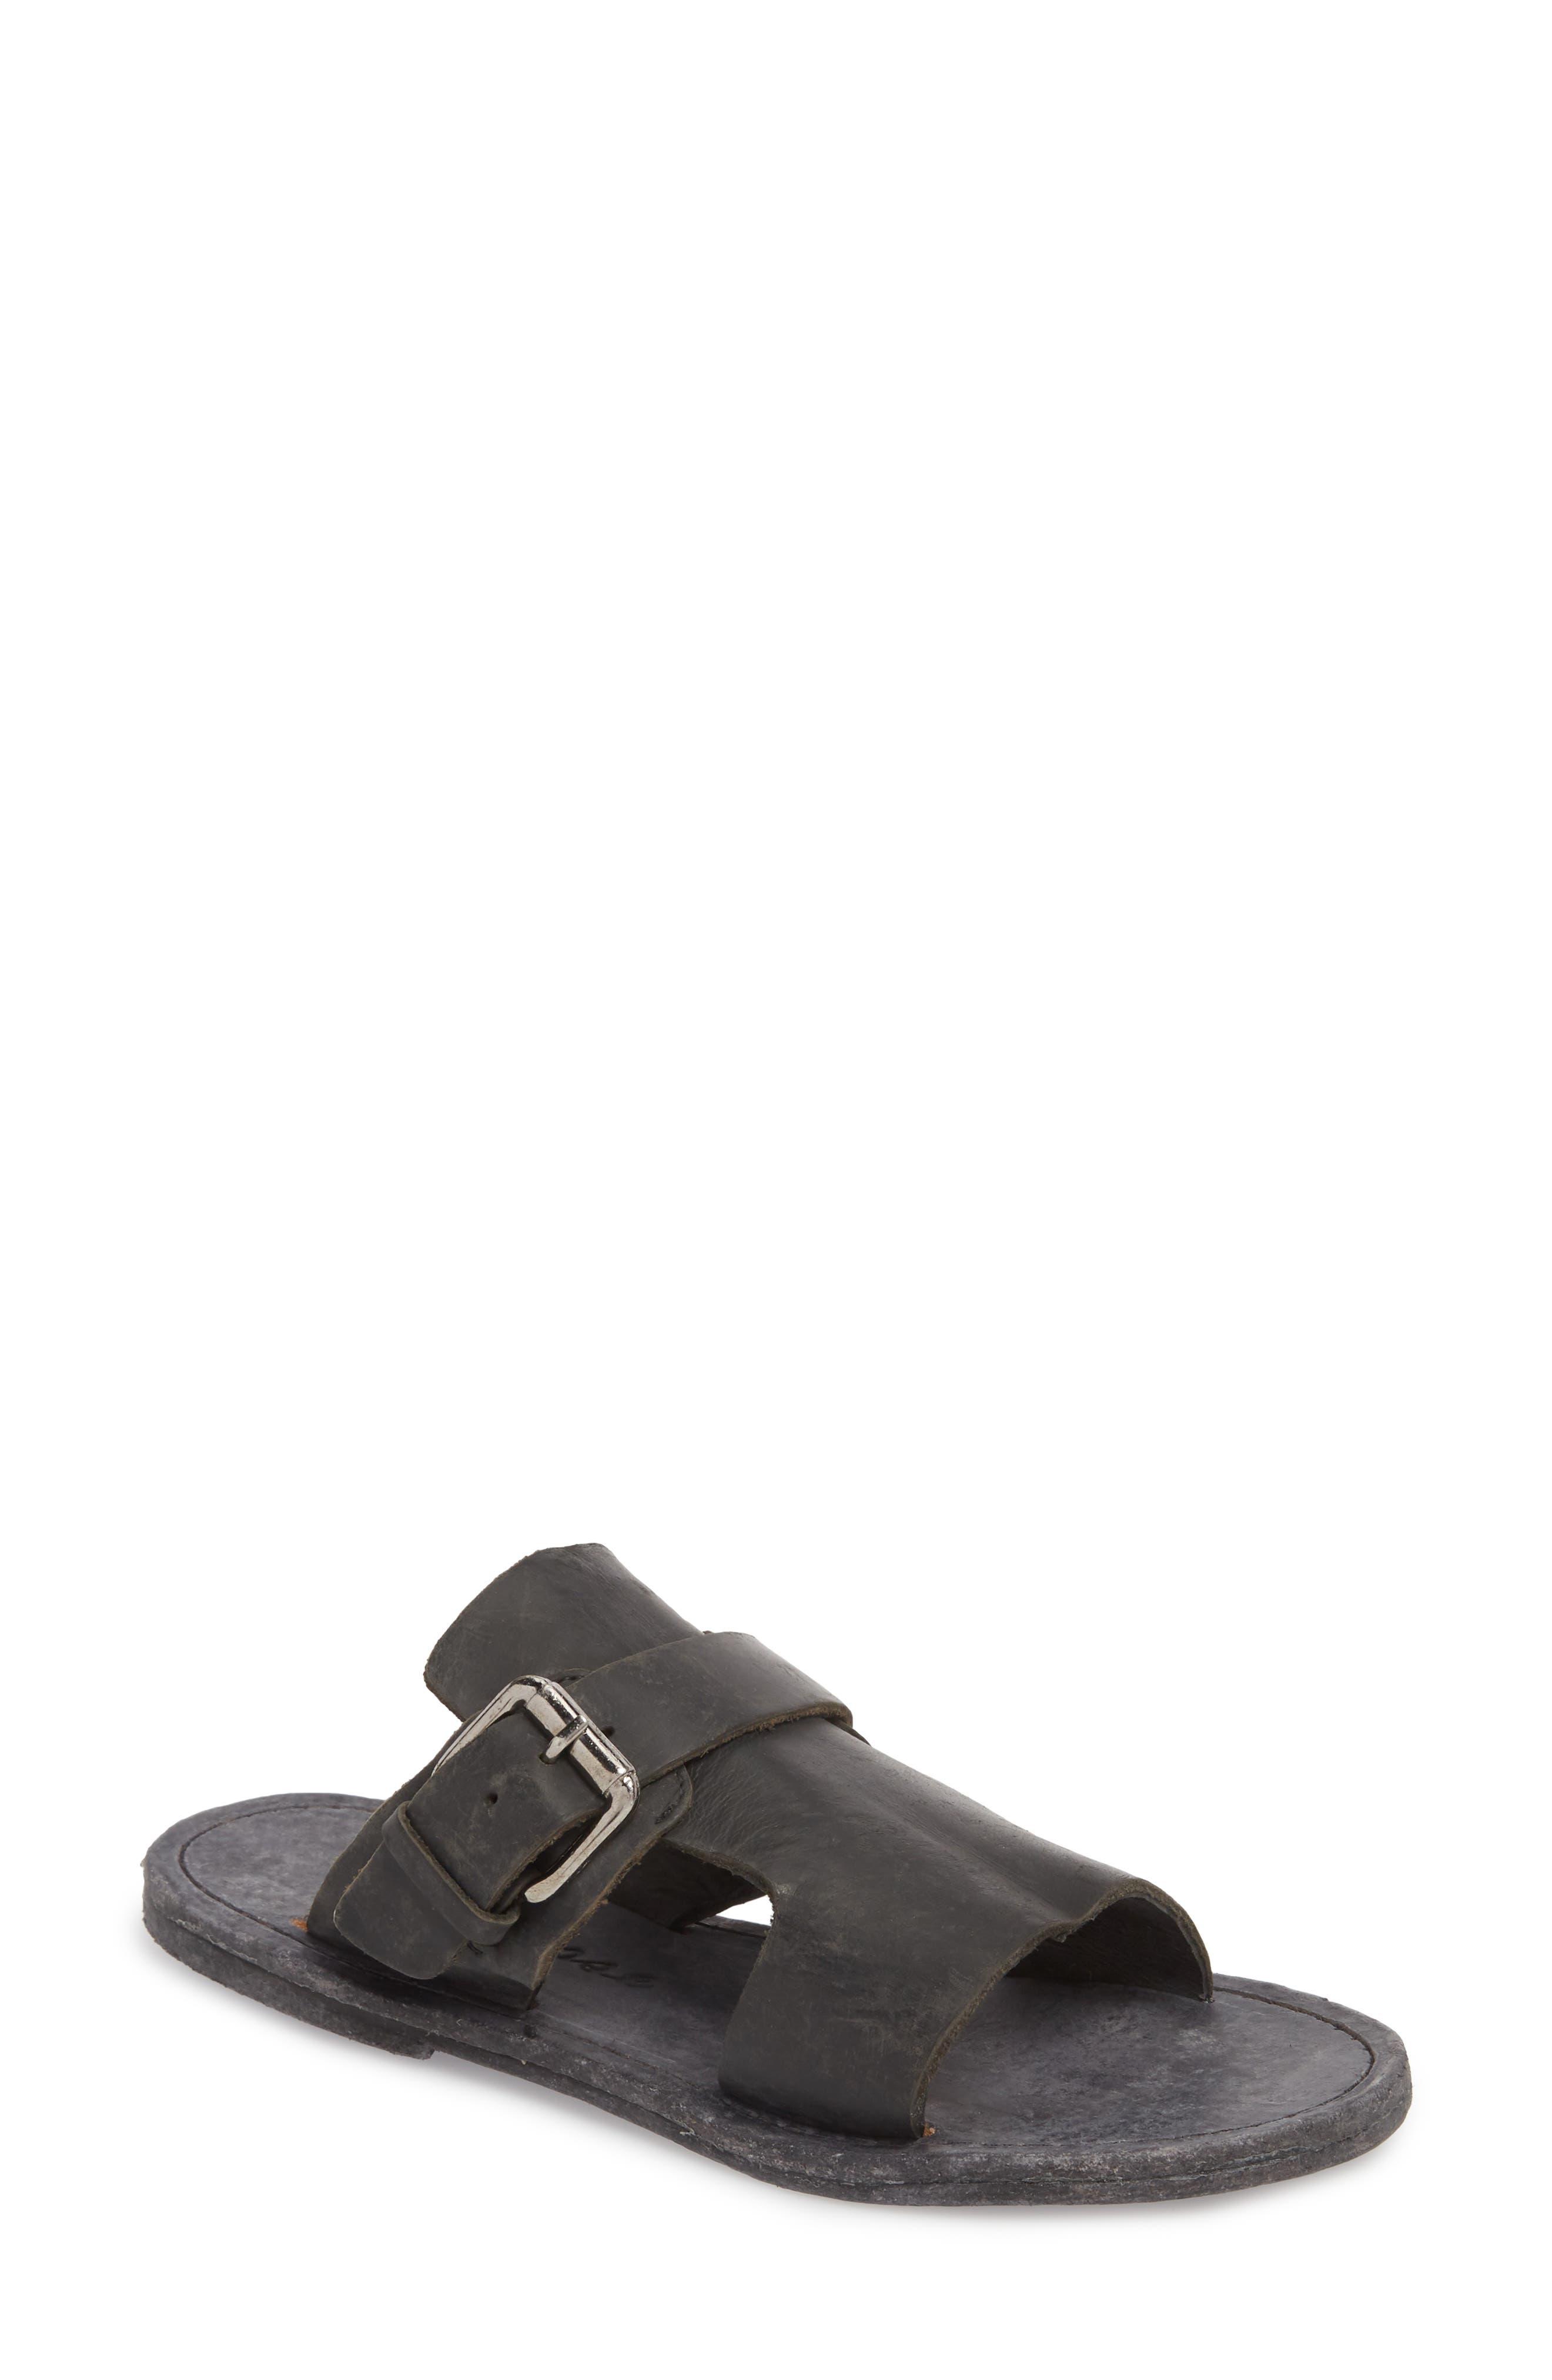 Abbie Slide Sandal,                         Main,                         color, BLACK LEATHER